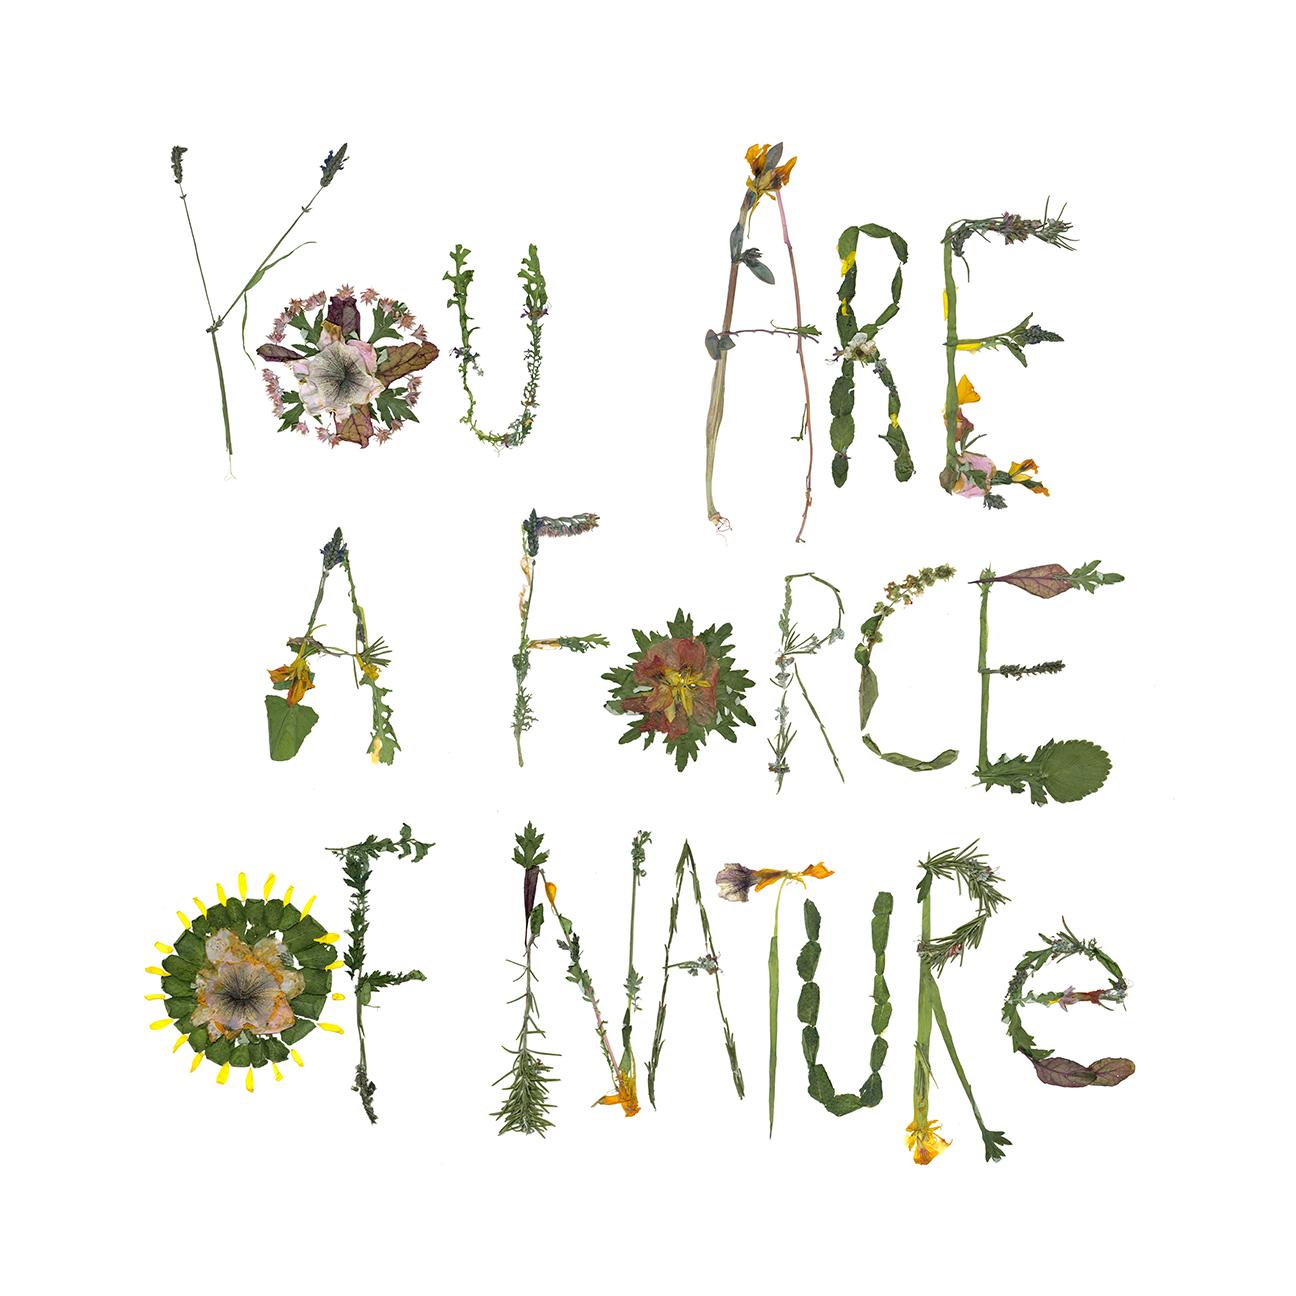 plants_force_of_nature_web.jpg